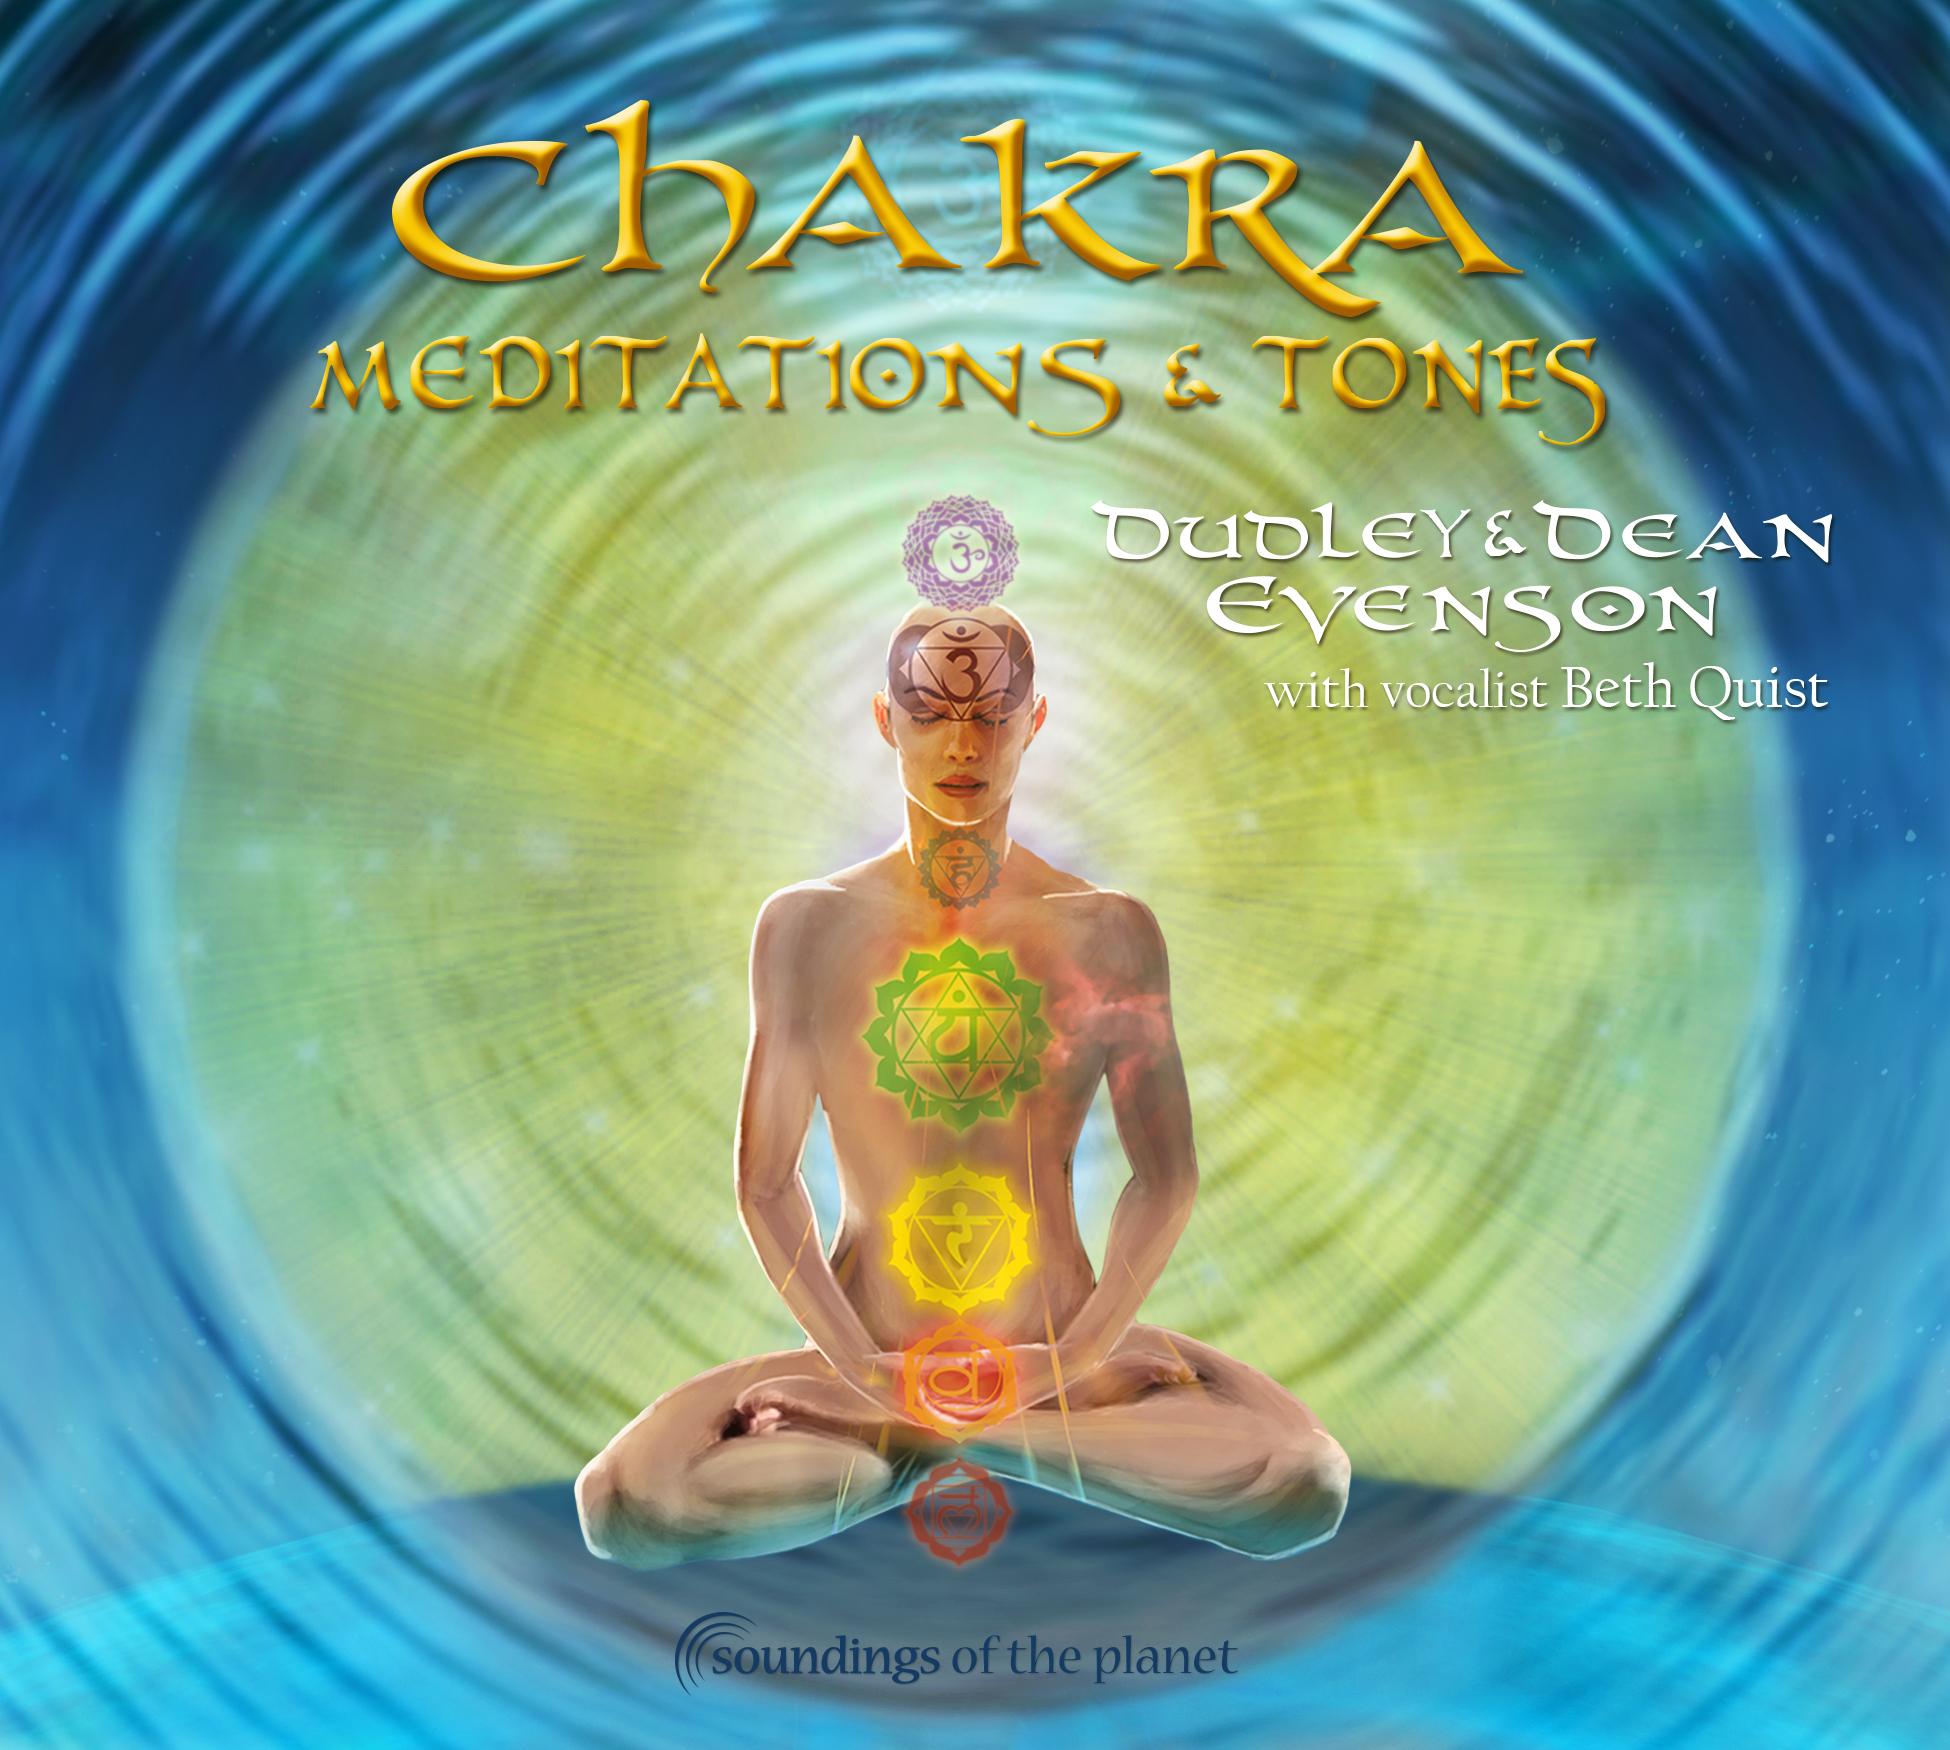 Chakra Meditations & Tones by Dudley & Dean Evenson